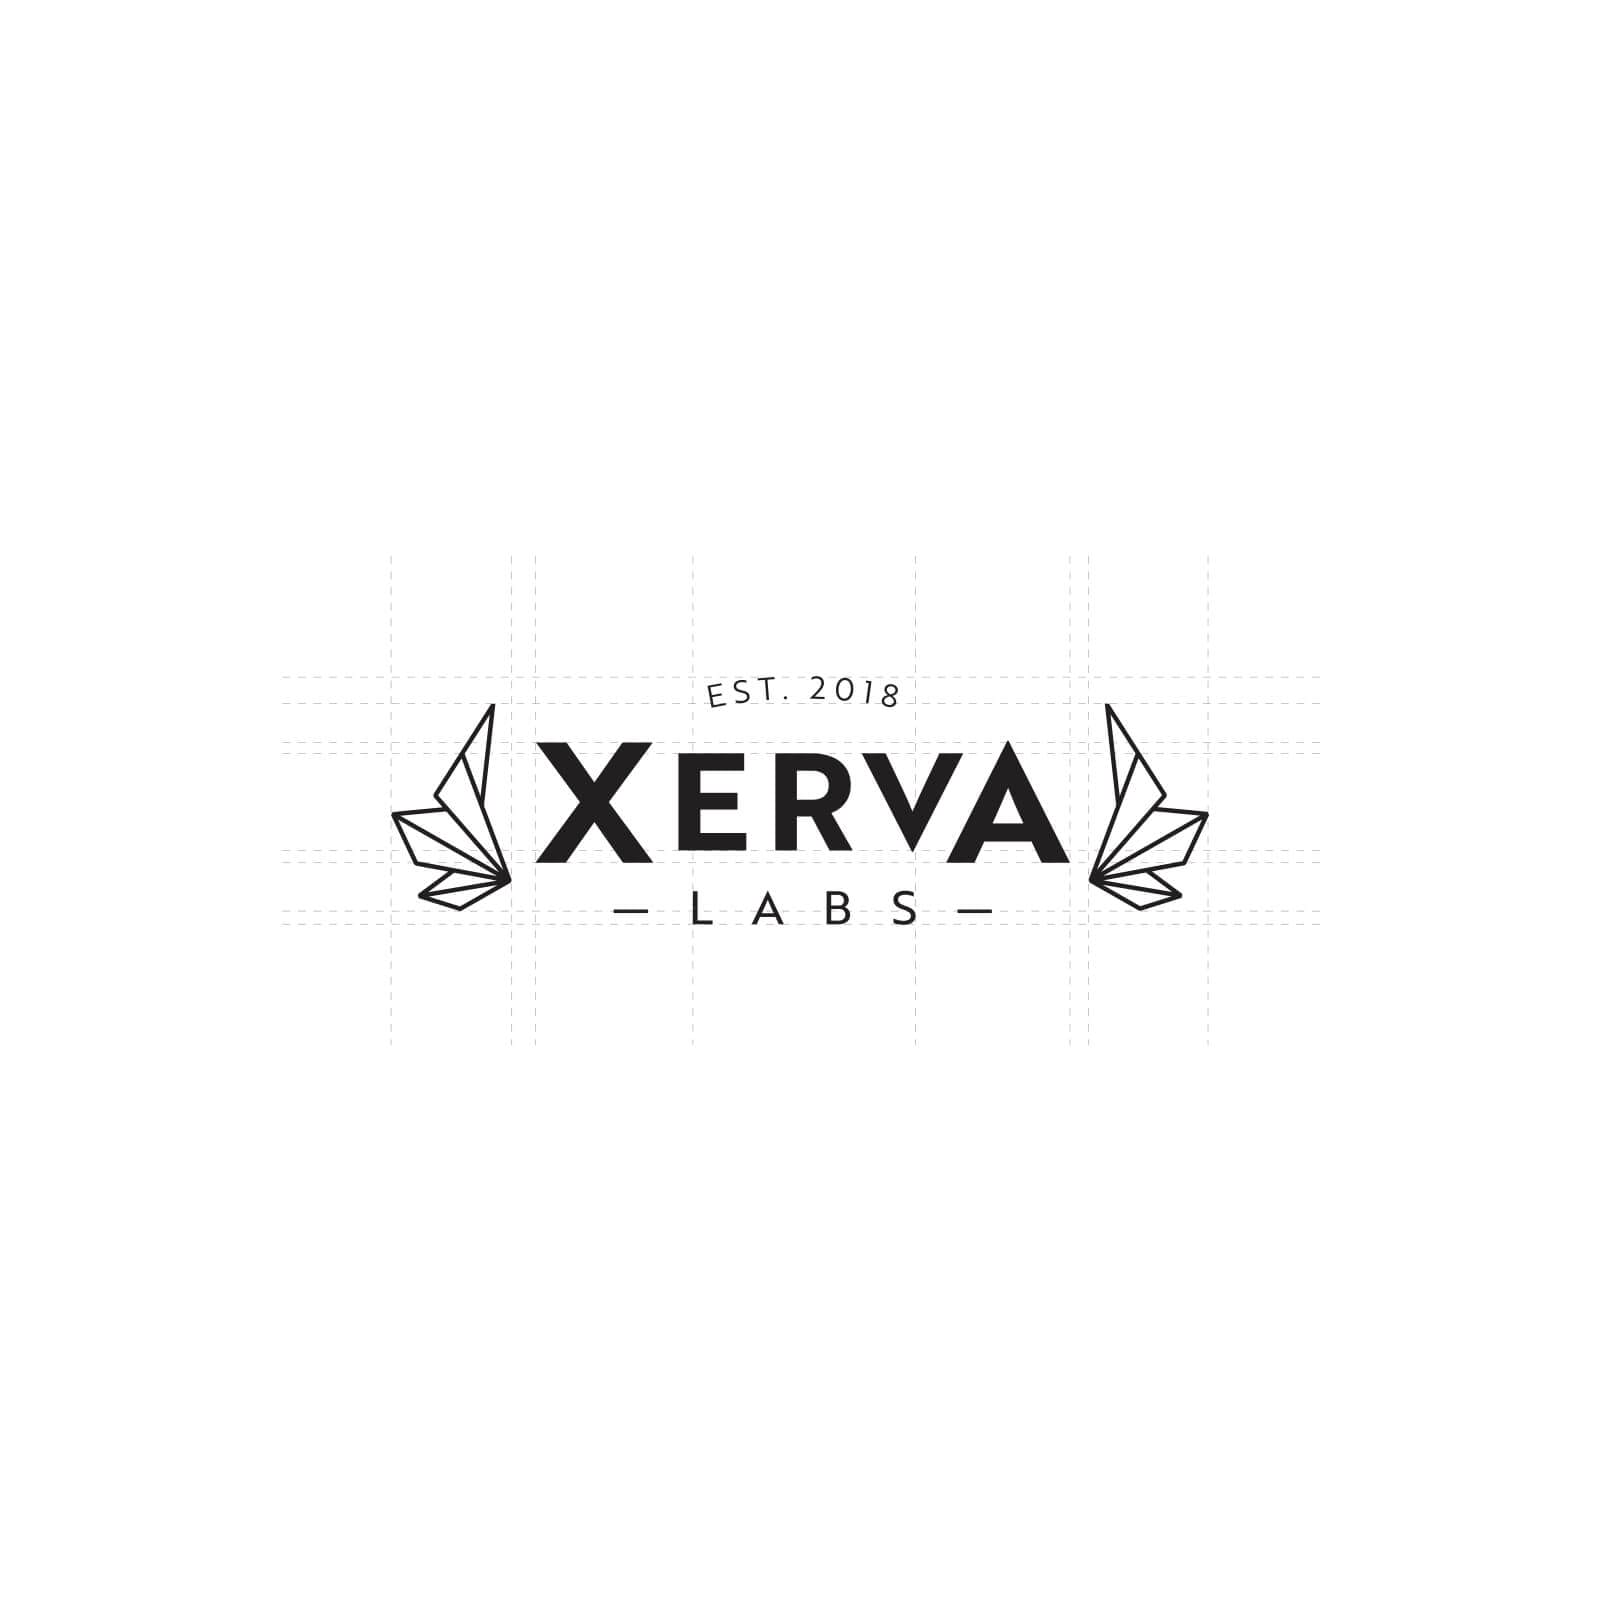 Y5 Creative Case Studies Xerva Work Process 1